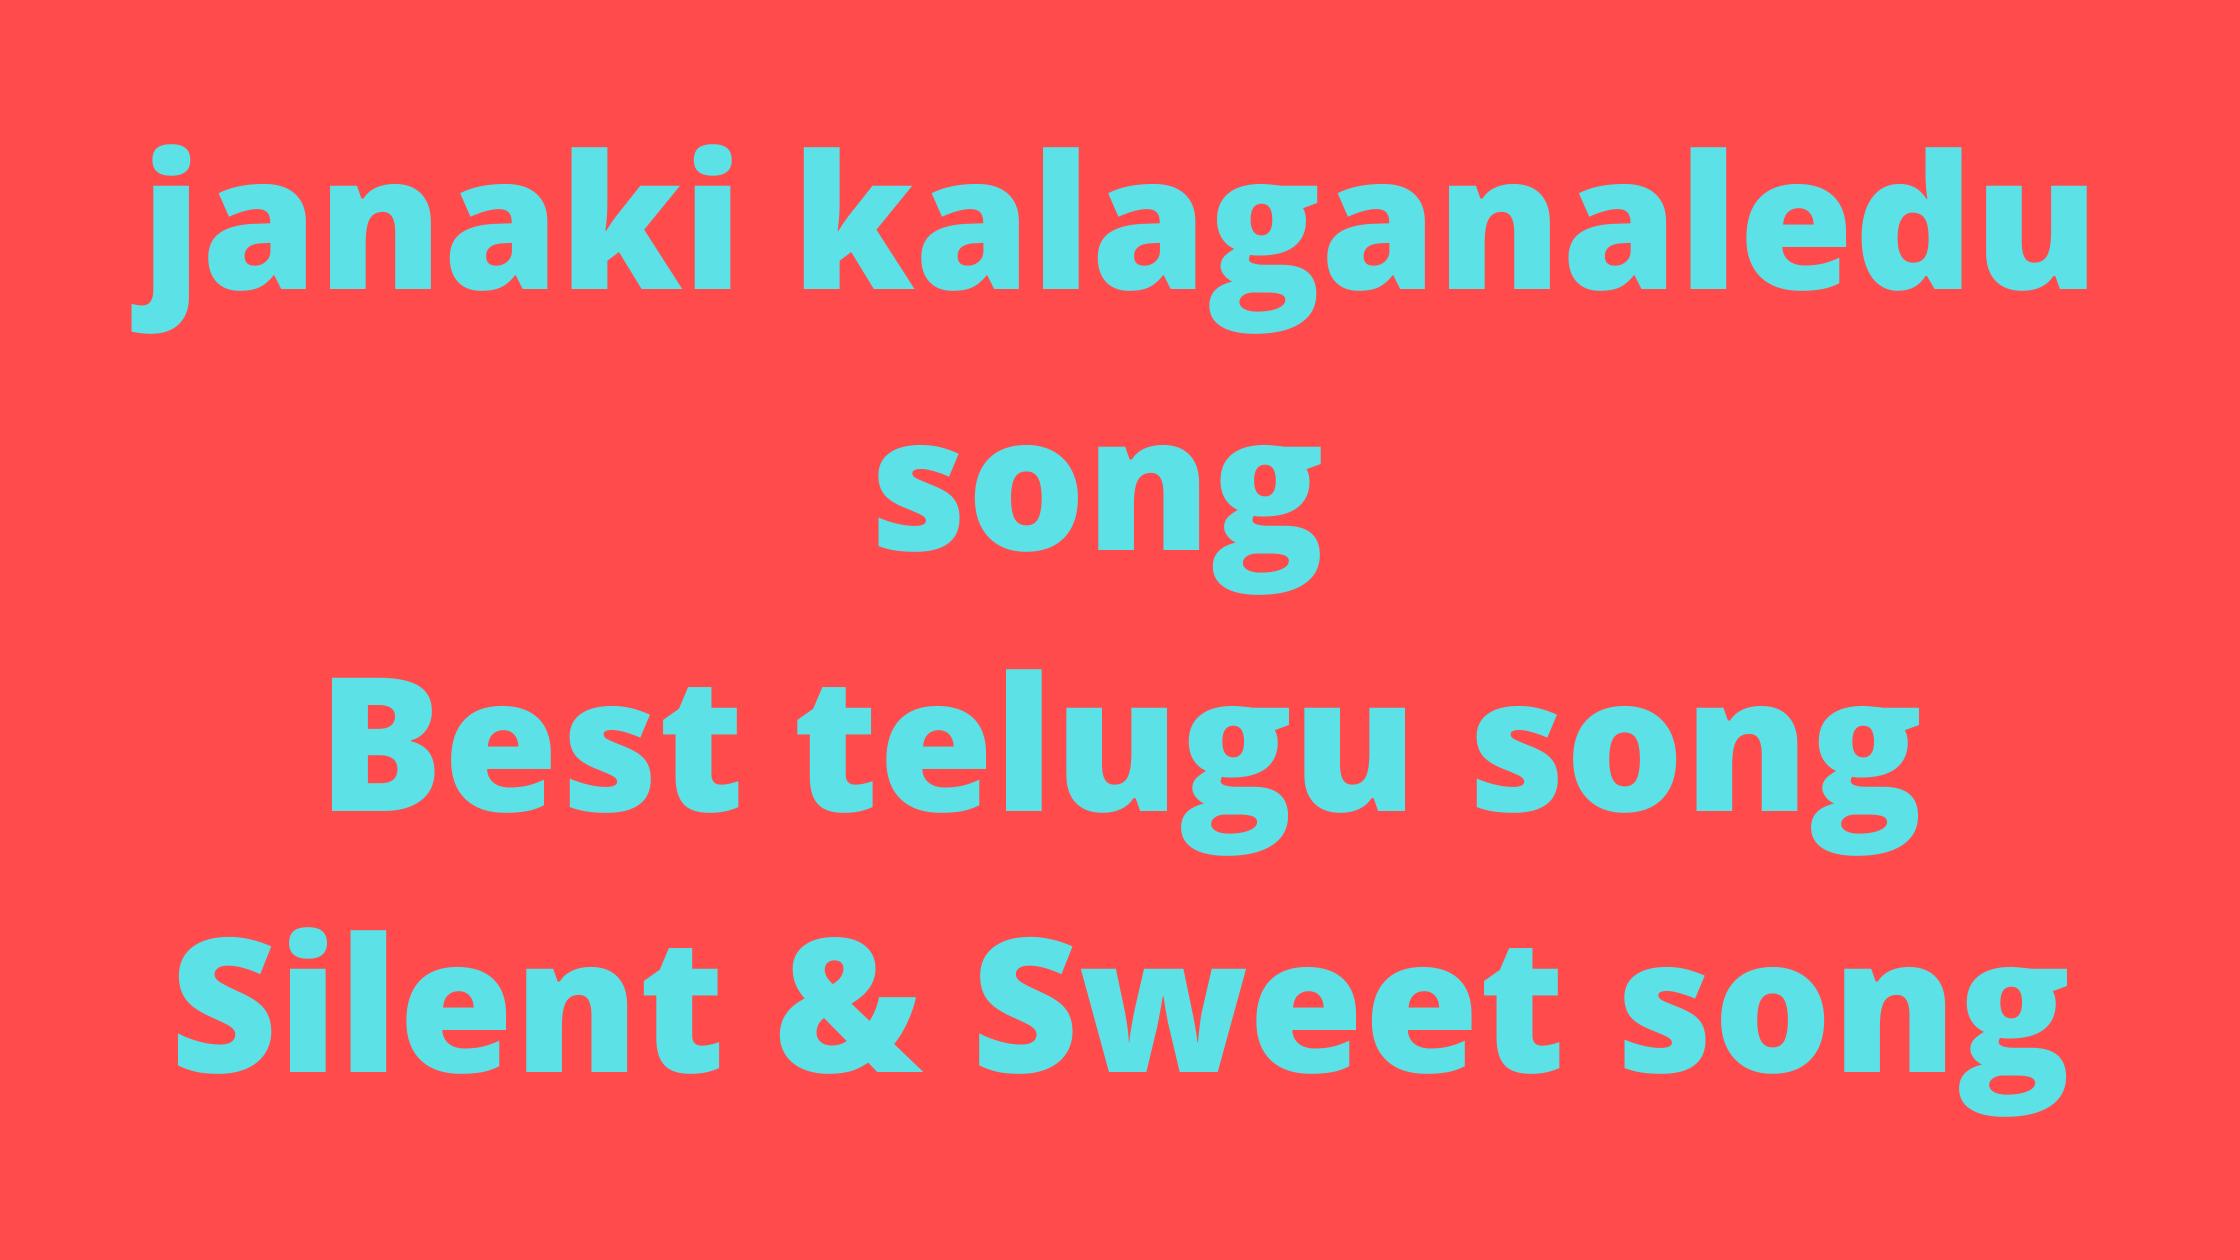 janaki kalaganaledu song | Best telugu songs